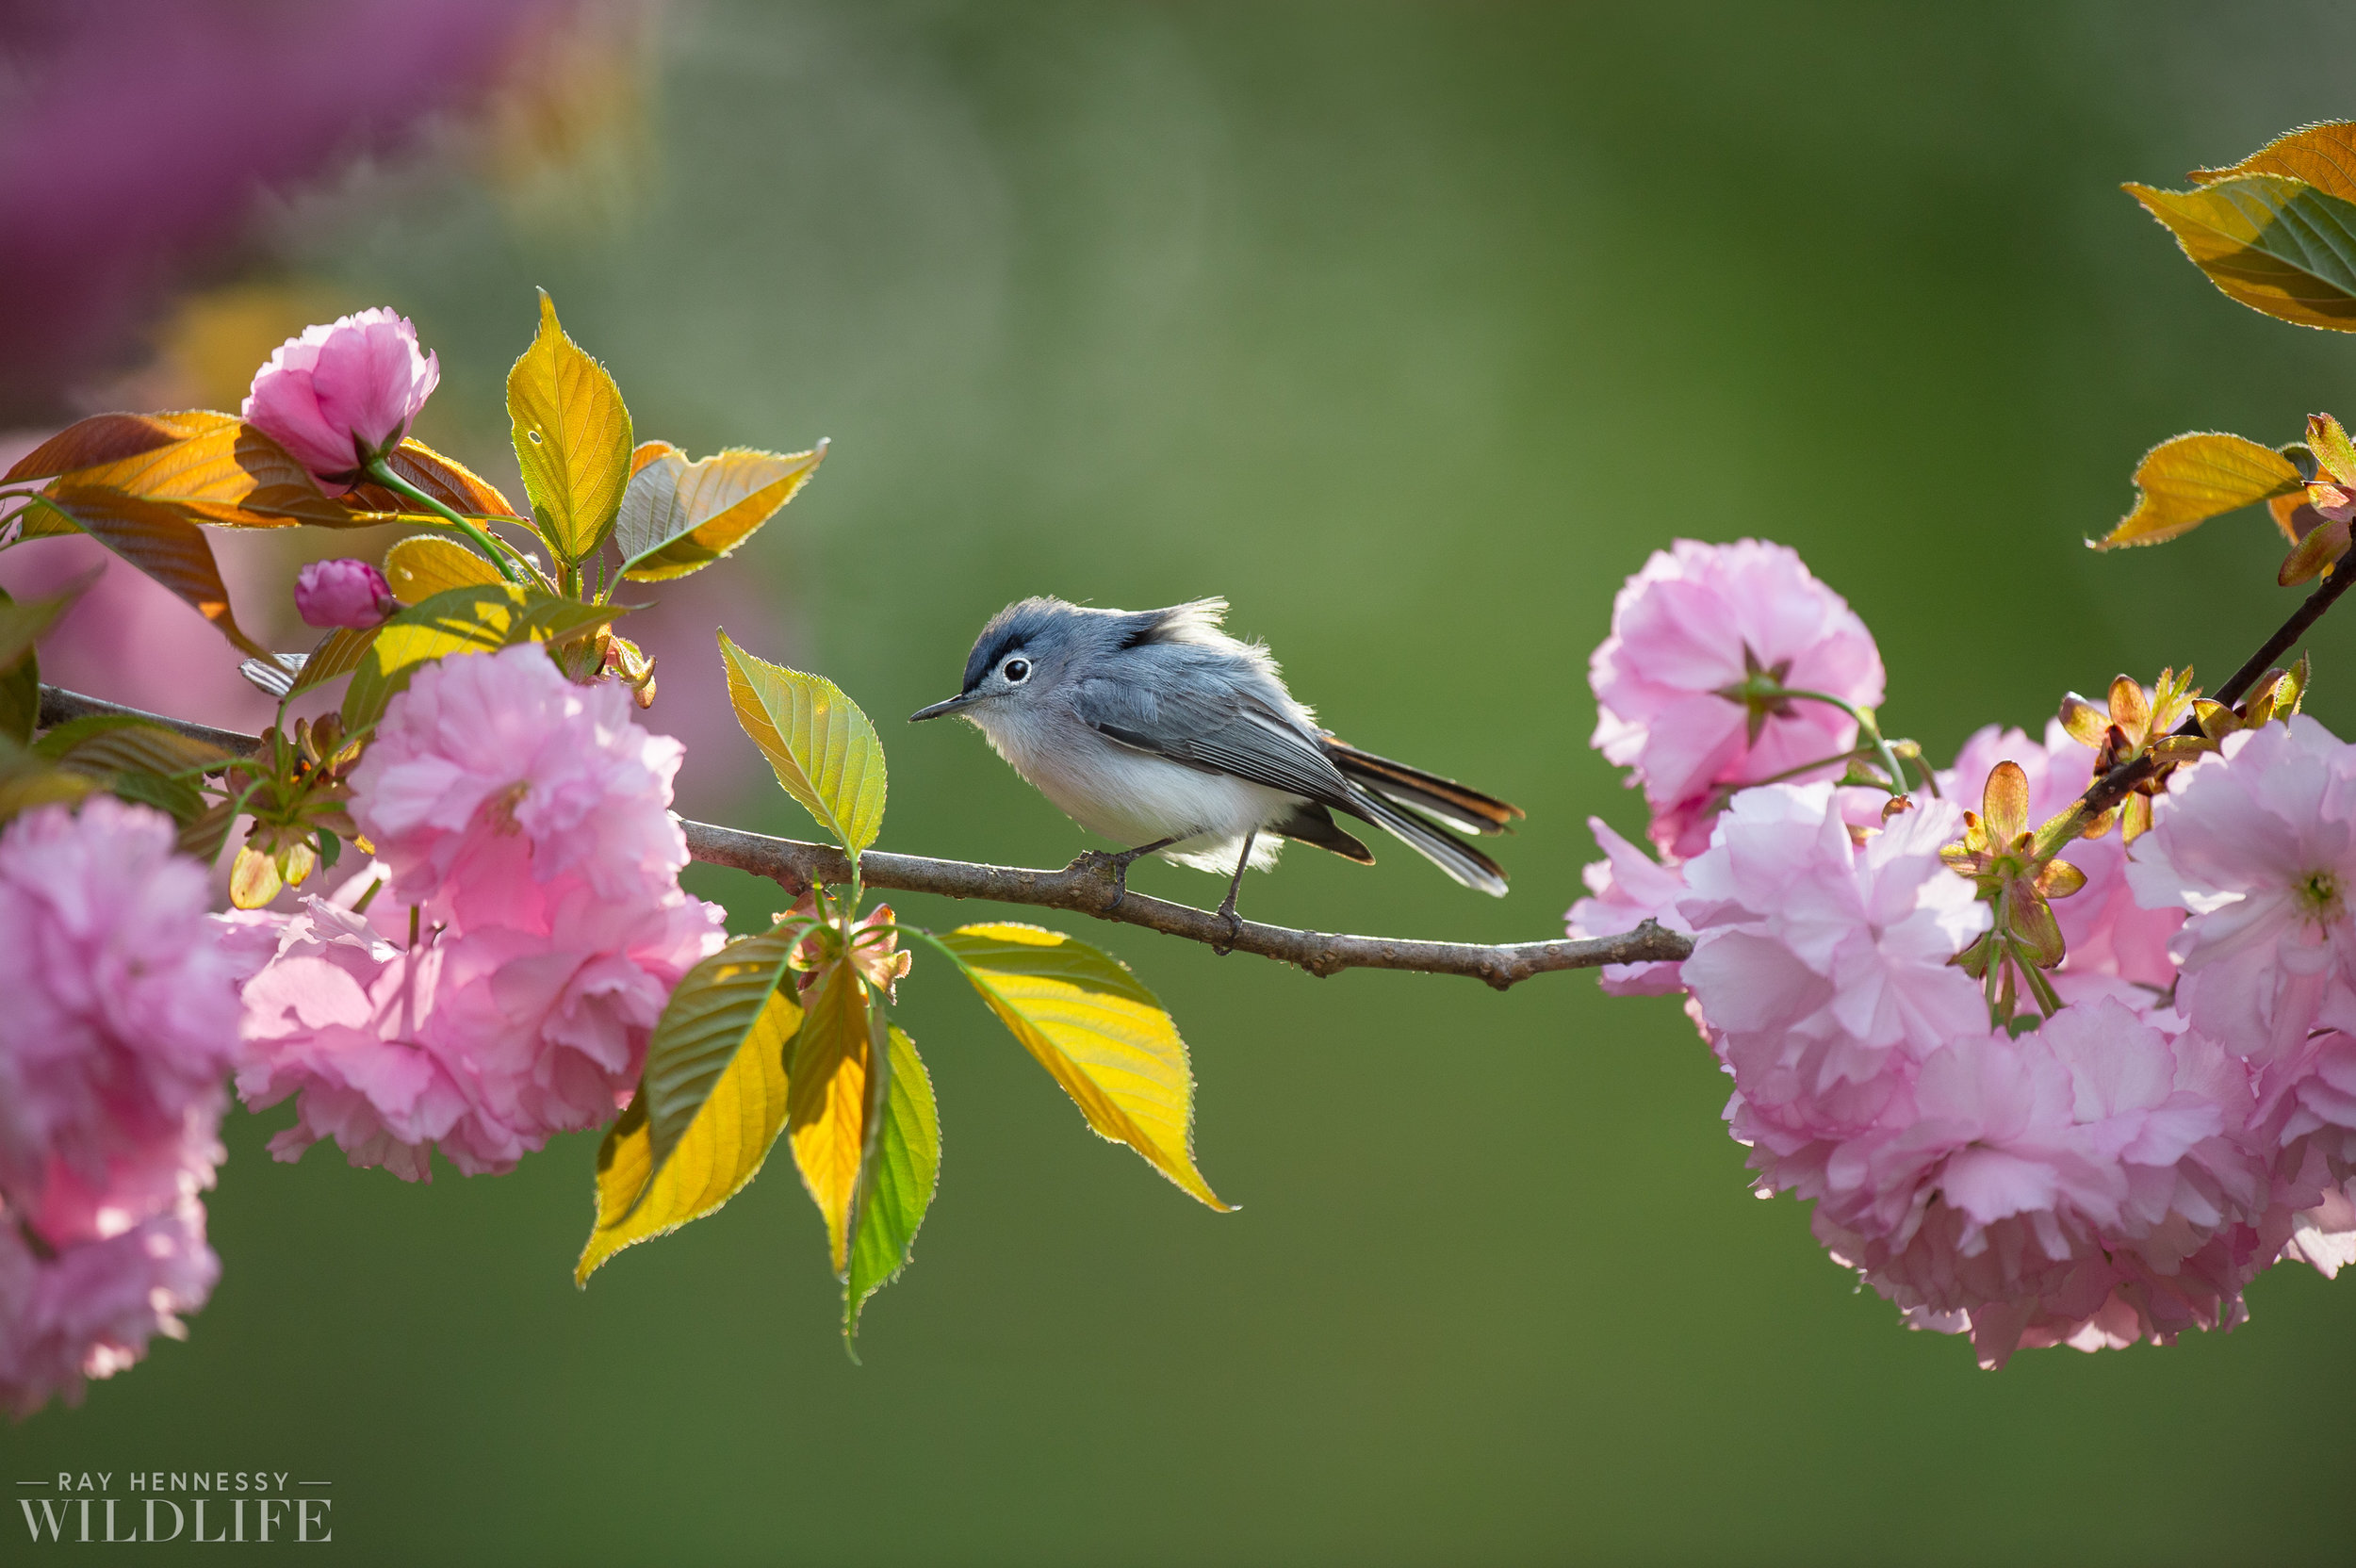 033_spring-warblers-new-jersey.jpg